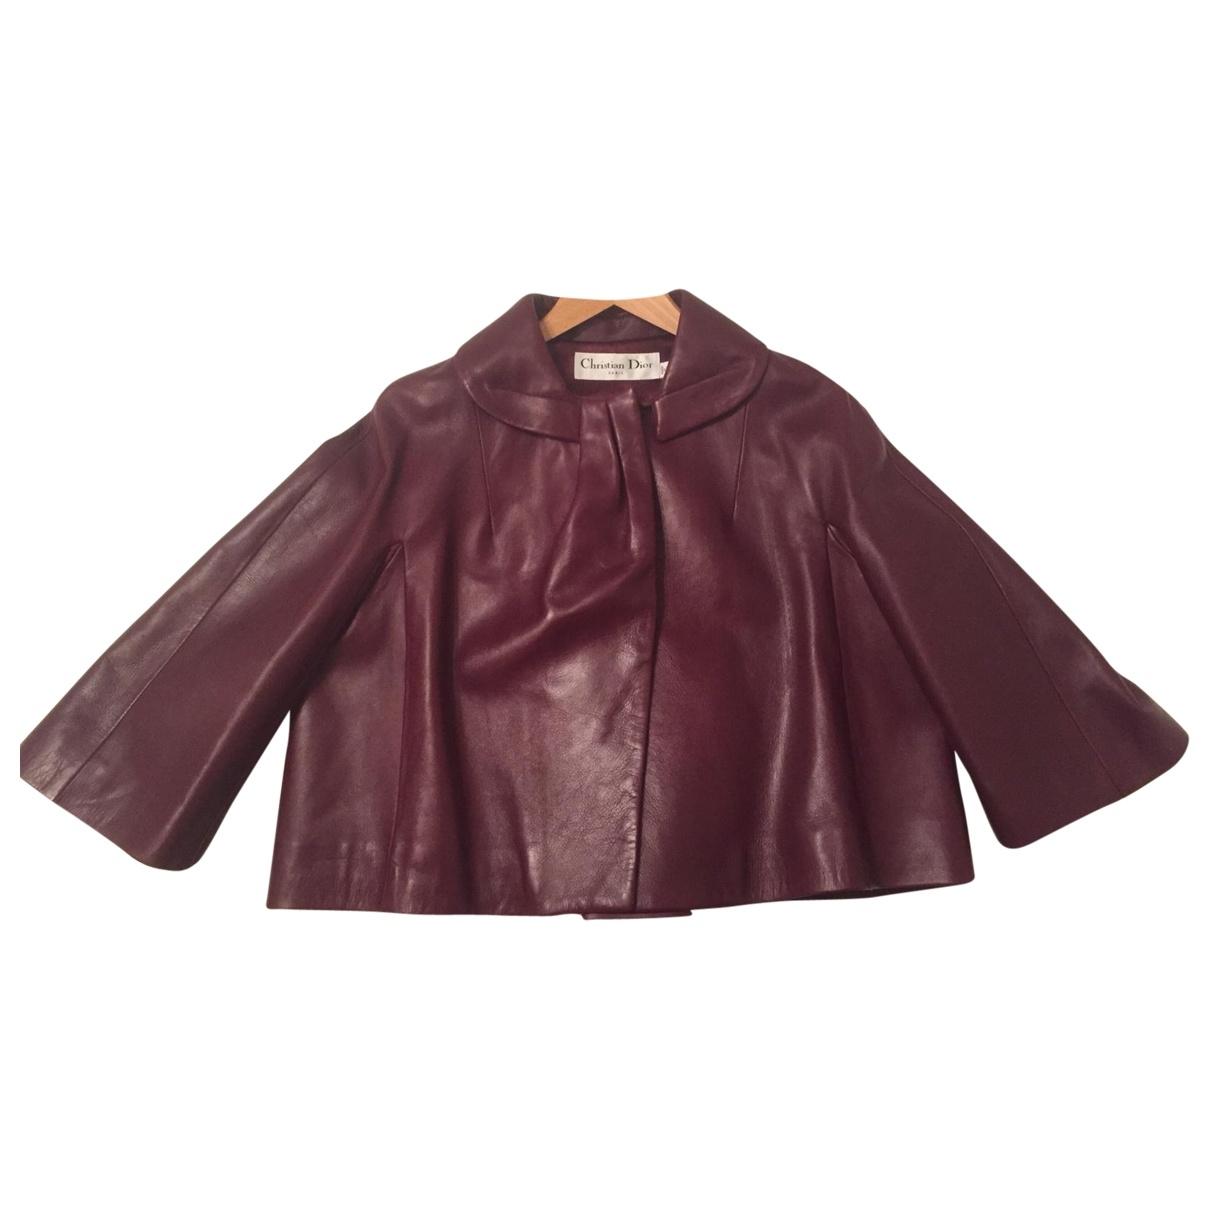 Dior - Veste   pour femme en cuir - violet